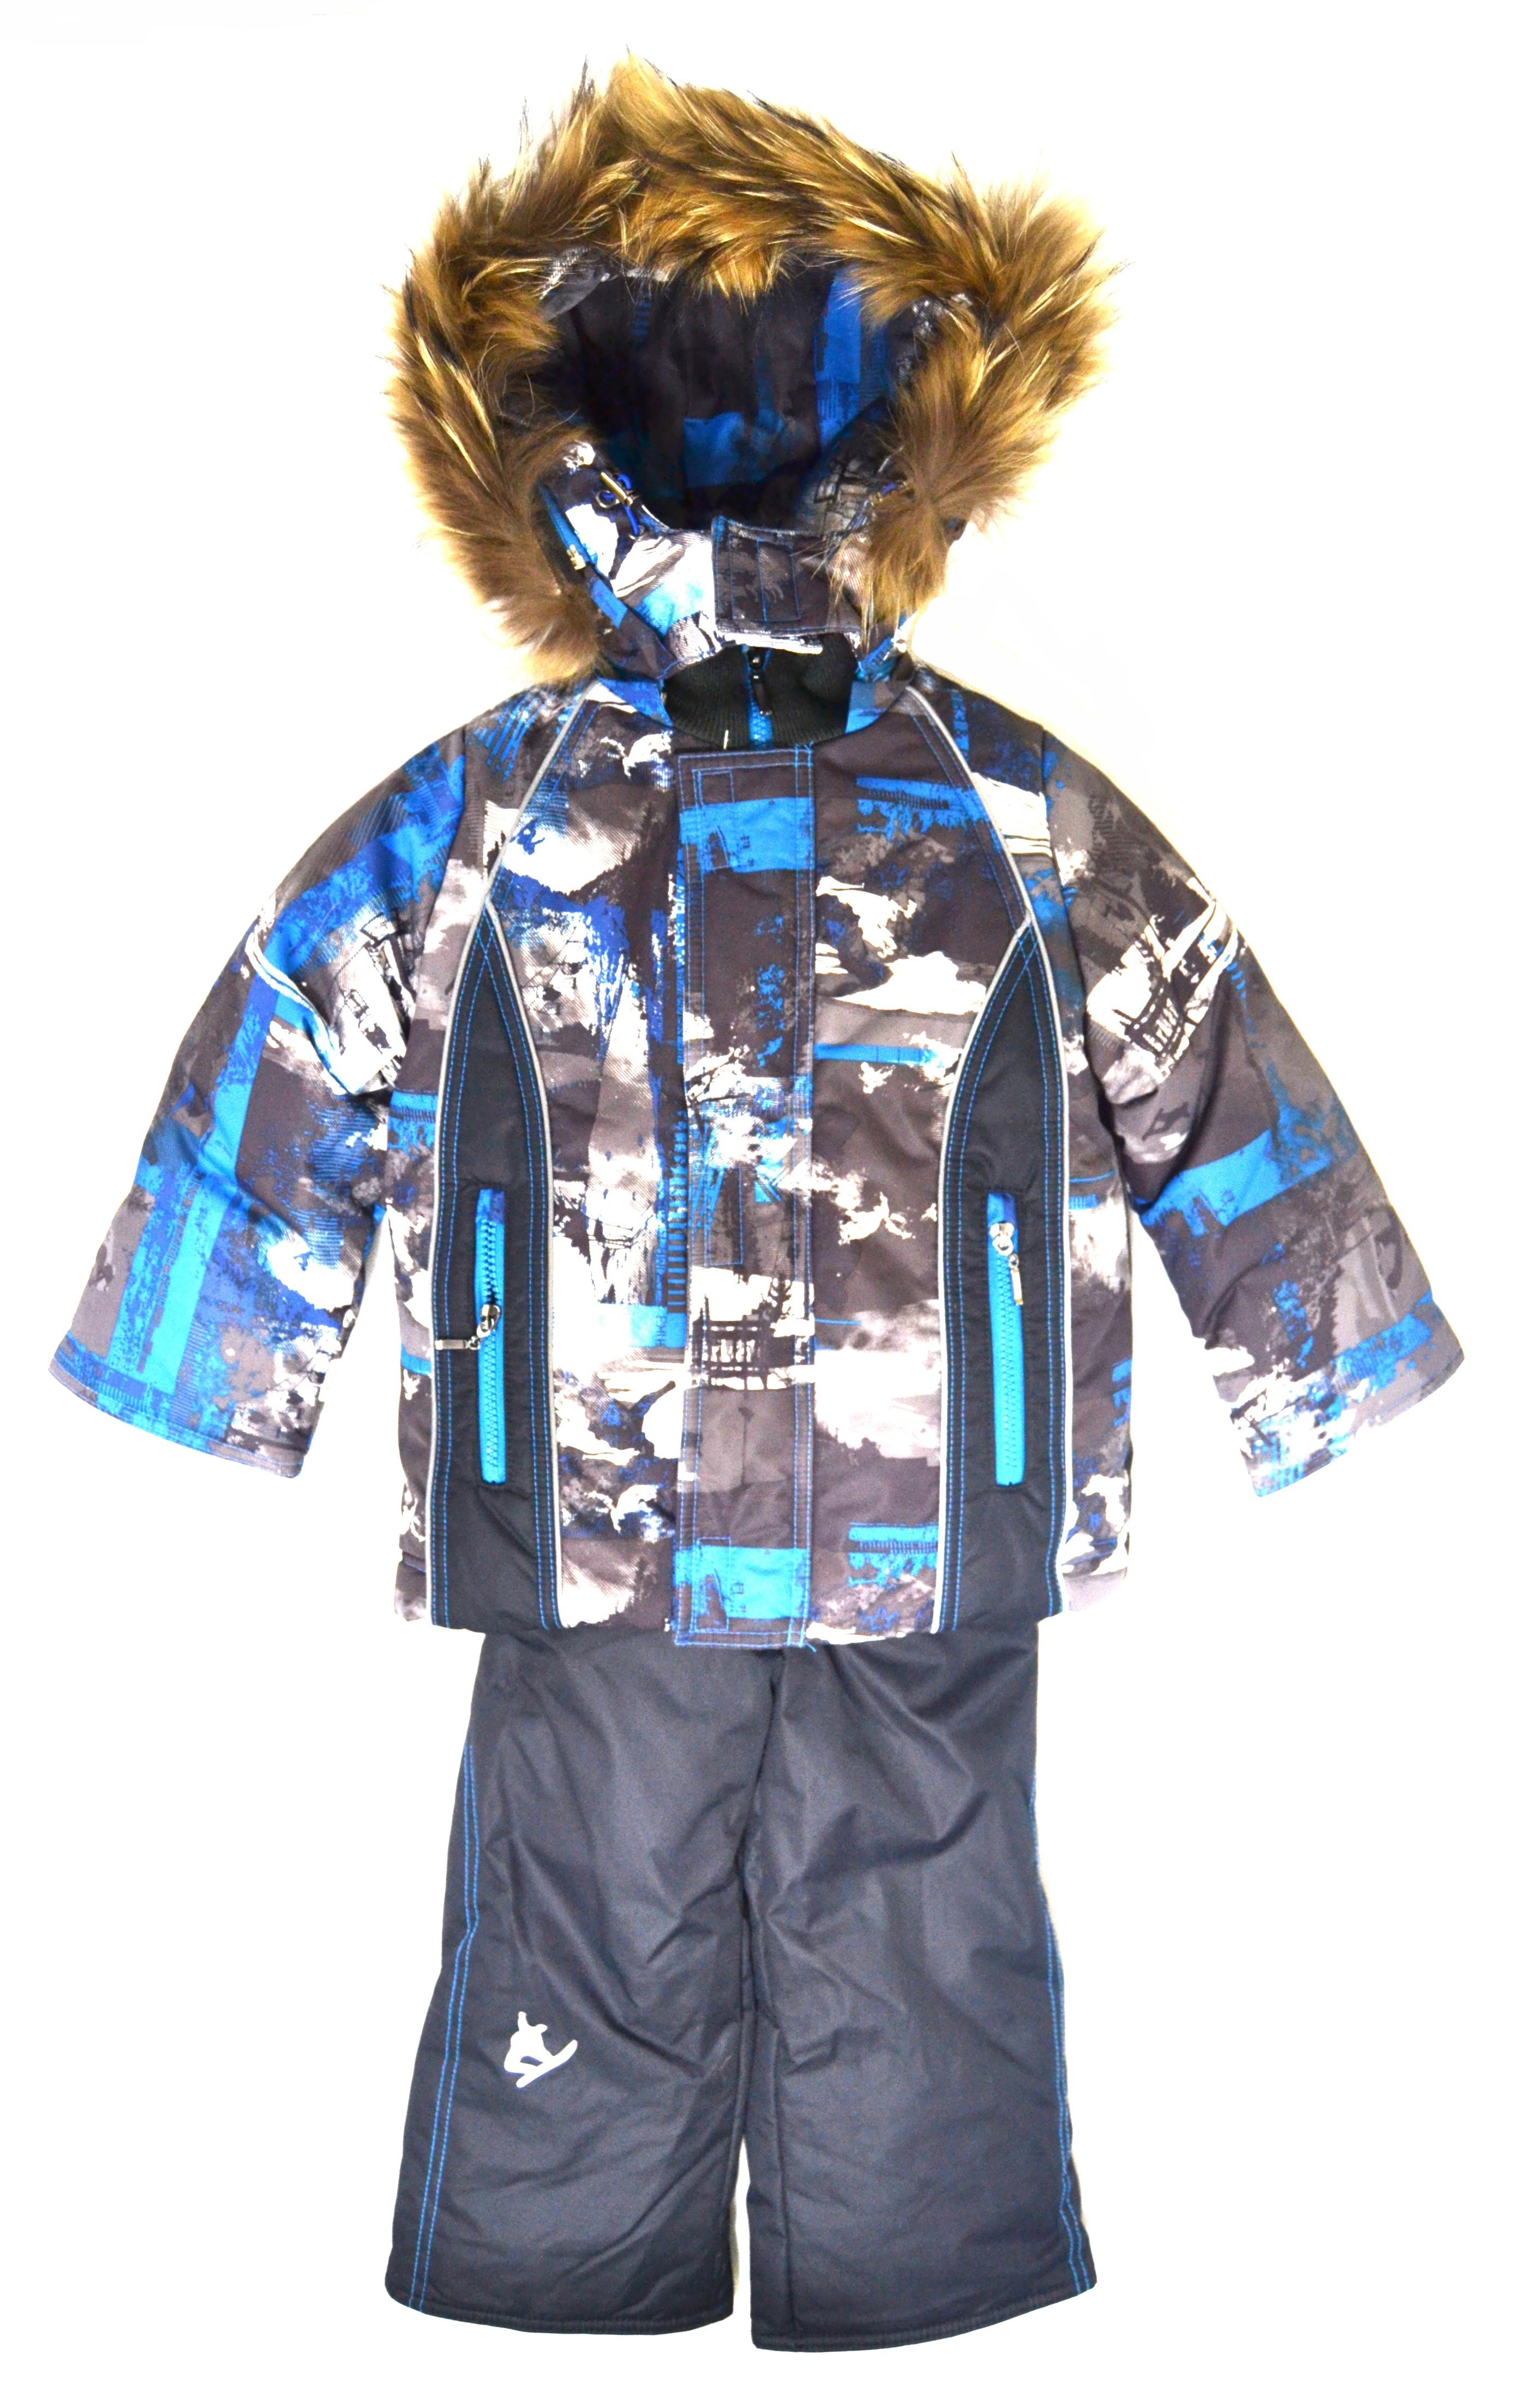 9c143fa82 Комплект для мальчика Фристайл | ▷Зимняя одежда | Магазин ...